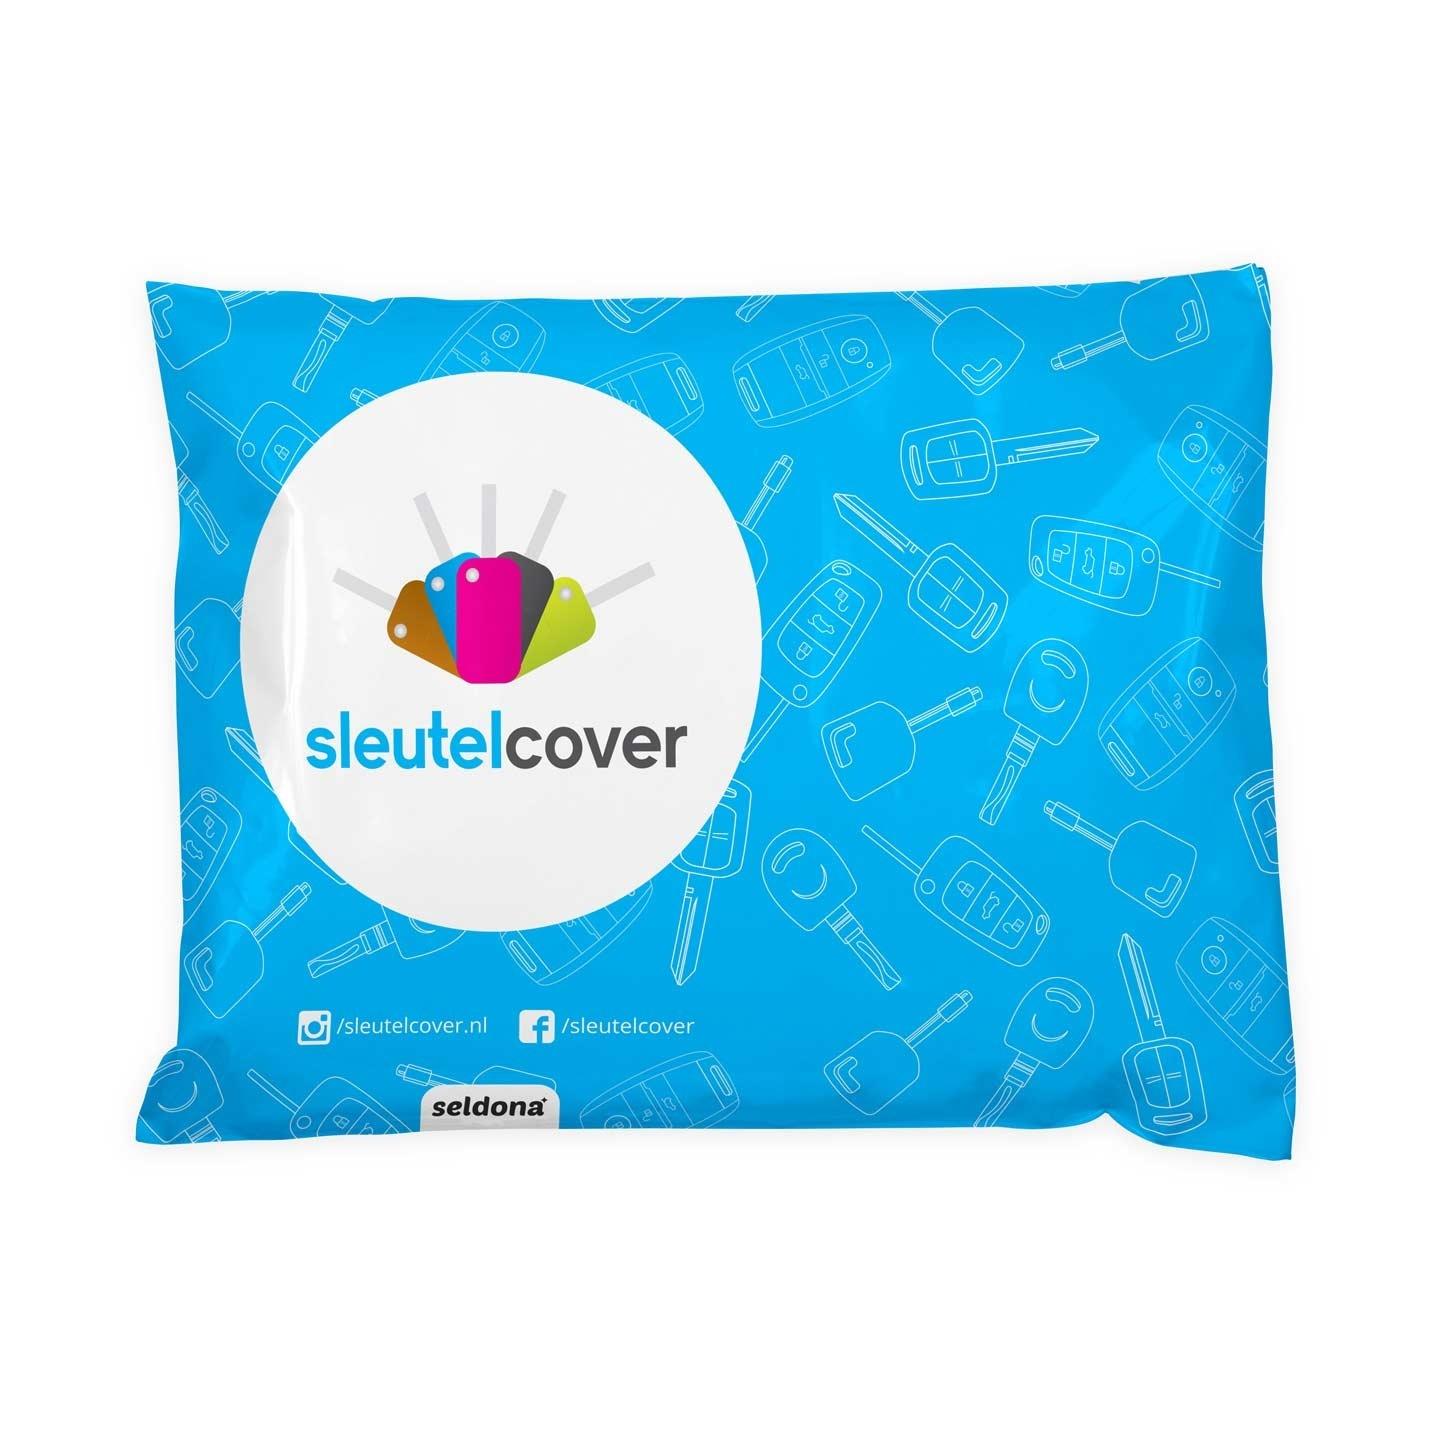 Land Rover SleutelCover - Lichtblauw / Silicone sleutelhoesje / beschermhoesje autosleutel